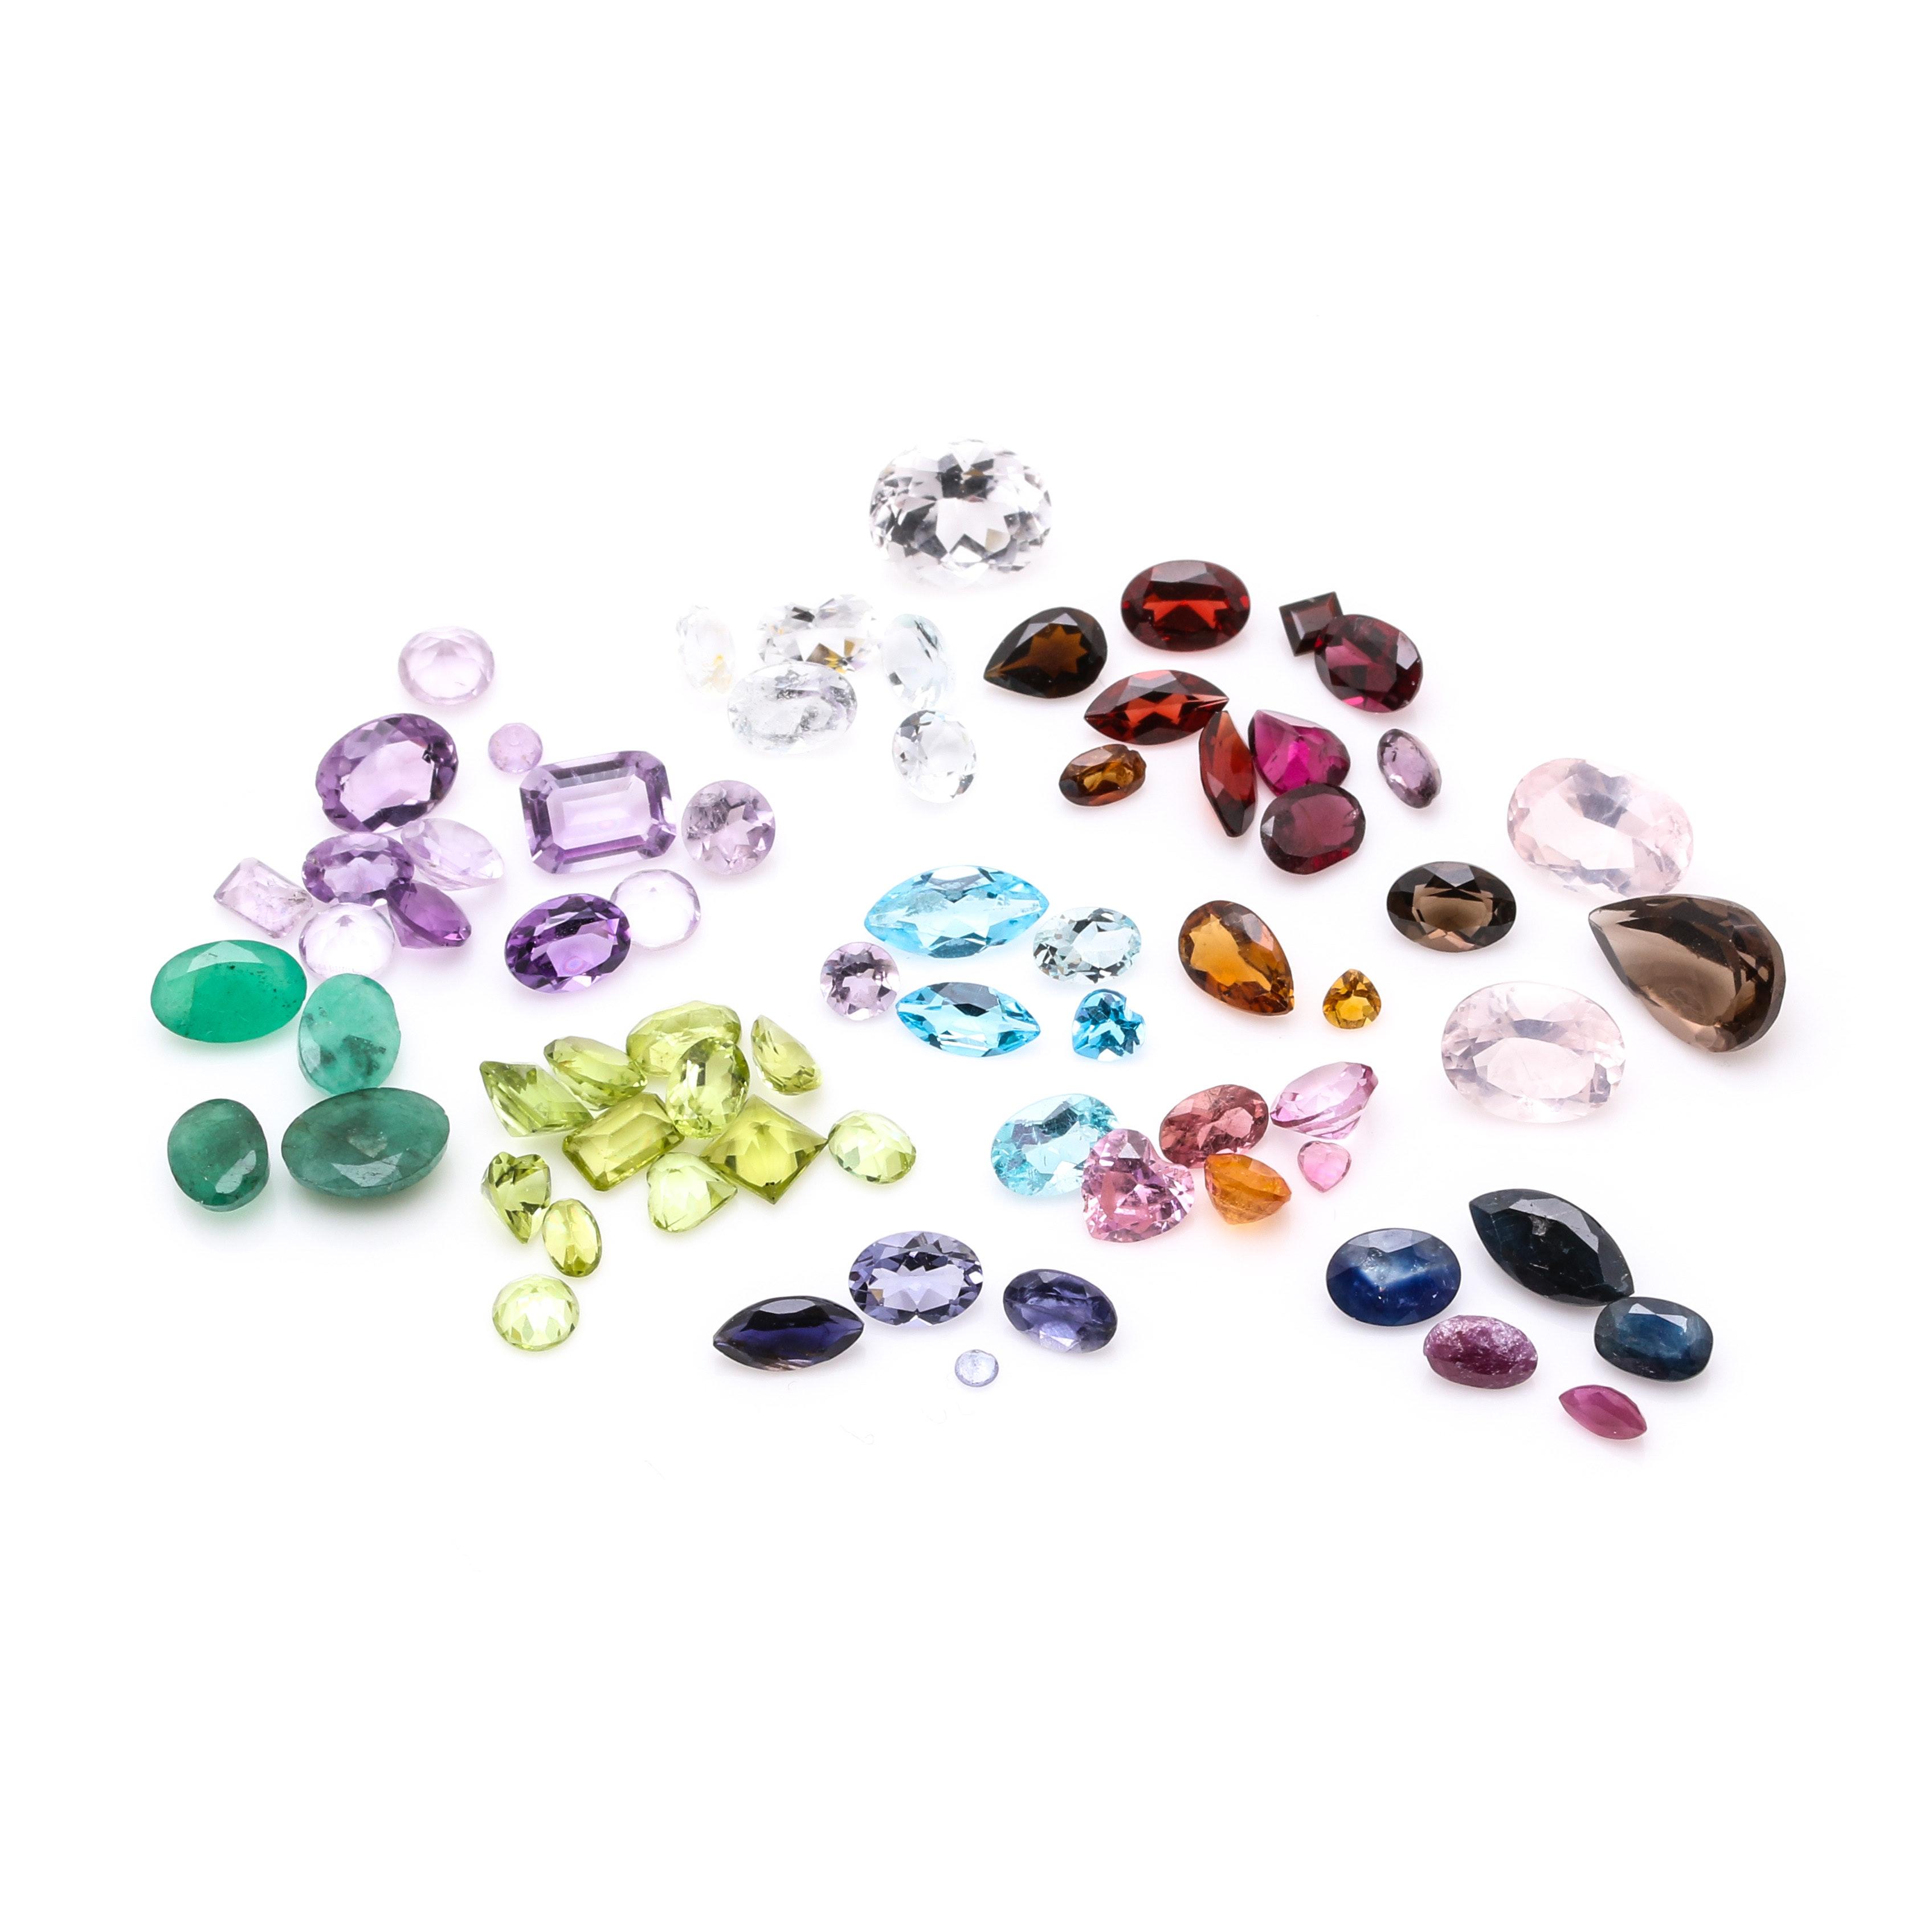 49.18 CTW Assorted Loose Gemstones